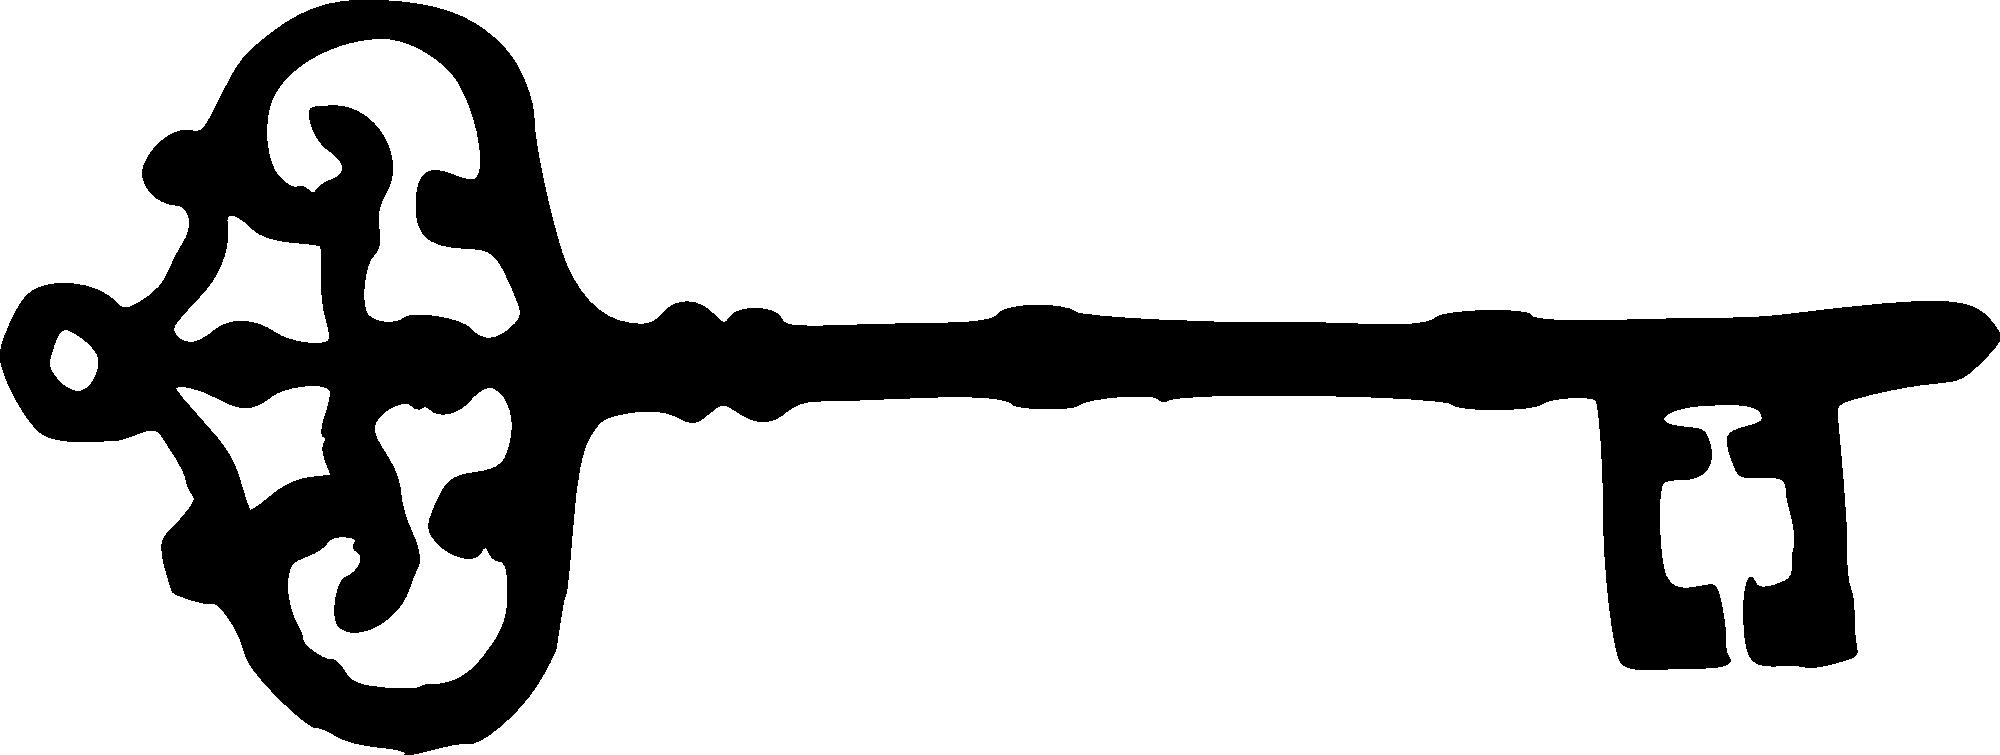 Heart skeleton key clipart banner download 8 Skeleton Key Silhouettes (PNG Transparent) | OnlyGFX.com banner download